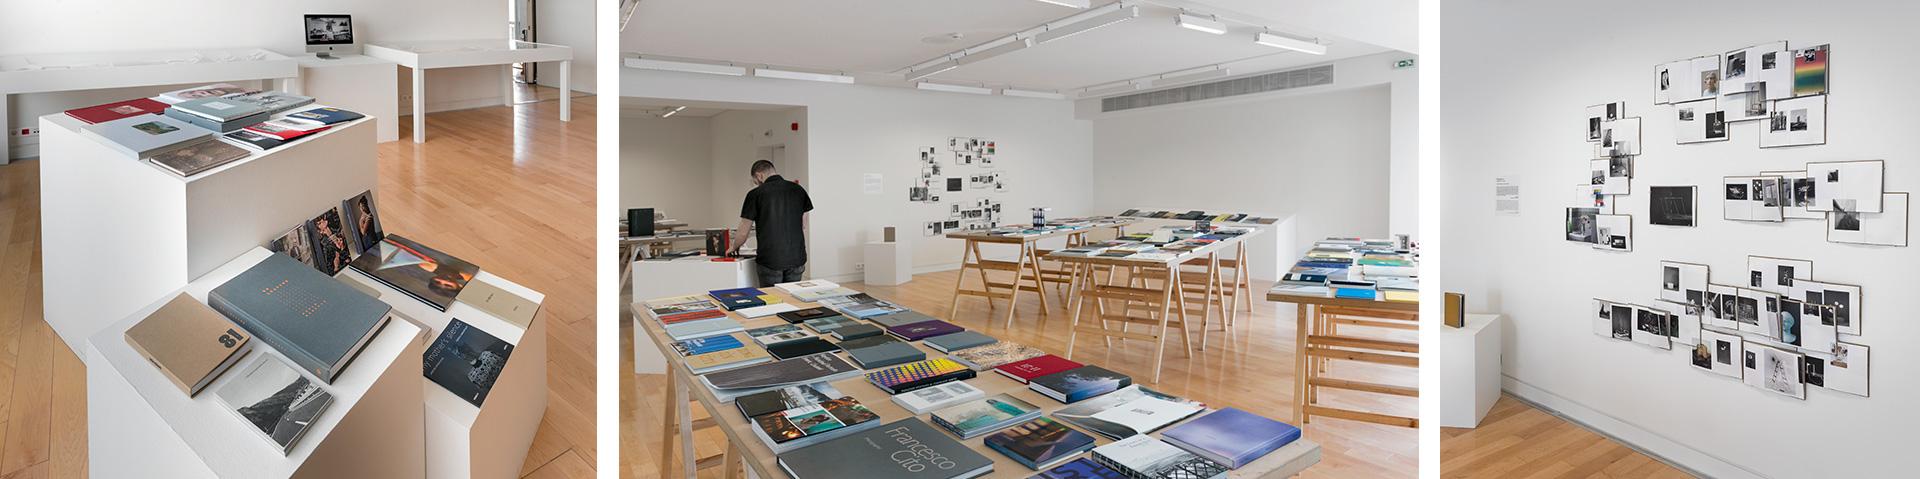 Photobook Exhibition at  Athens Photo Festival